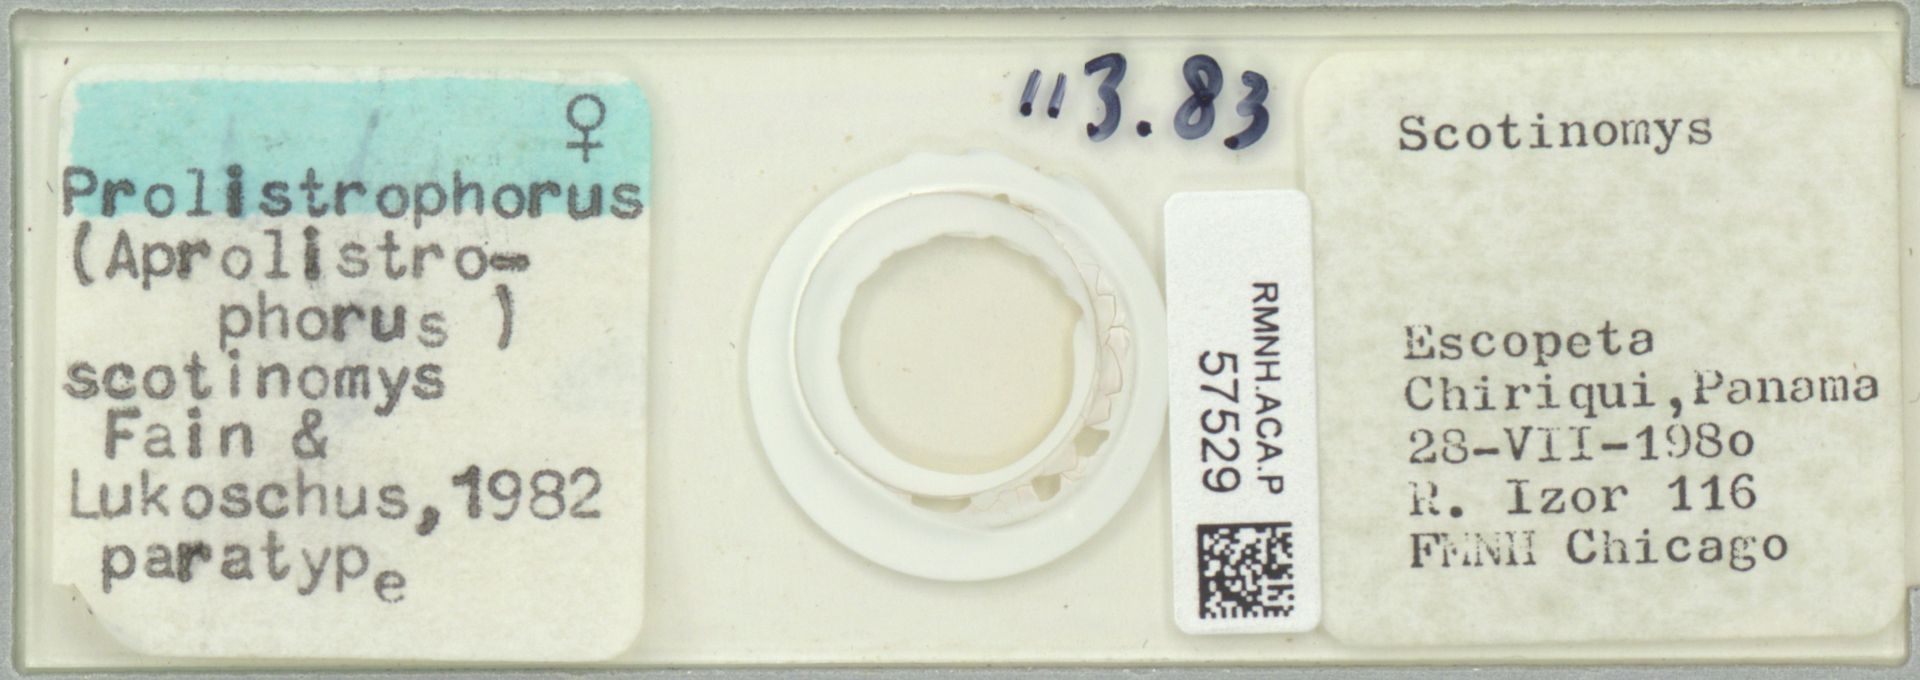 RMNH.ACA.P.57529 | Prolistrophorus (Aprolistrophorus) scotinomys Fain & Lukoschus, 1982